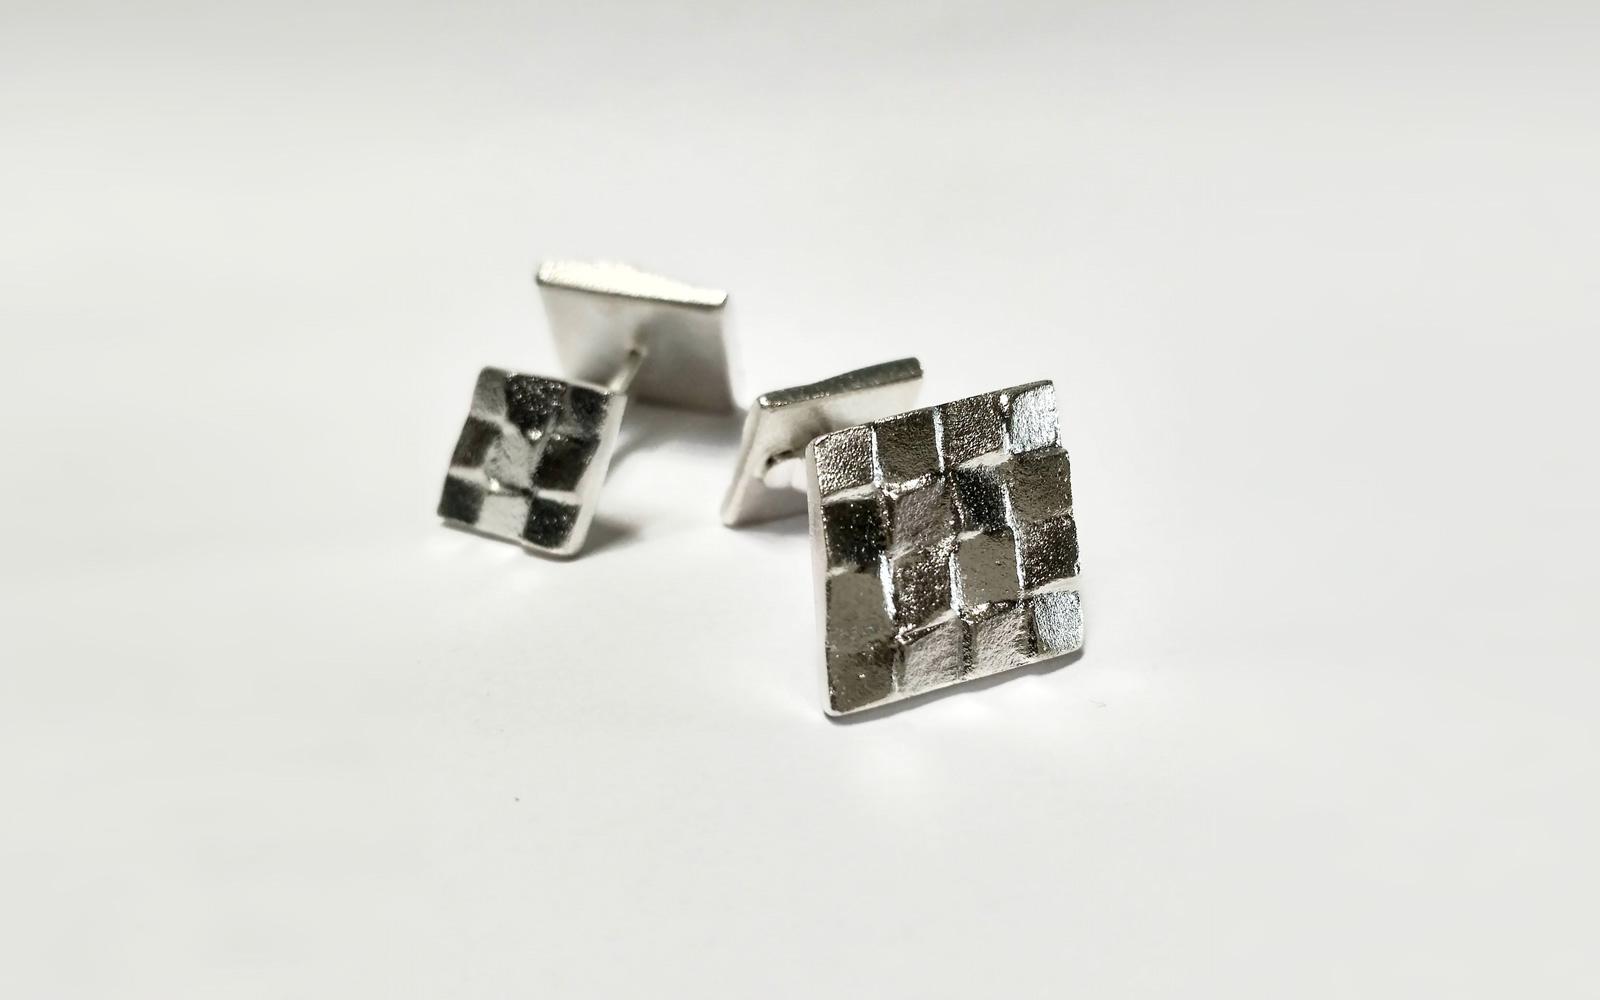 Manschettenknöpfe / Sandguss Silber